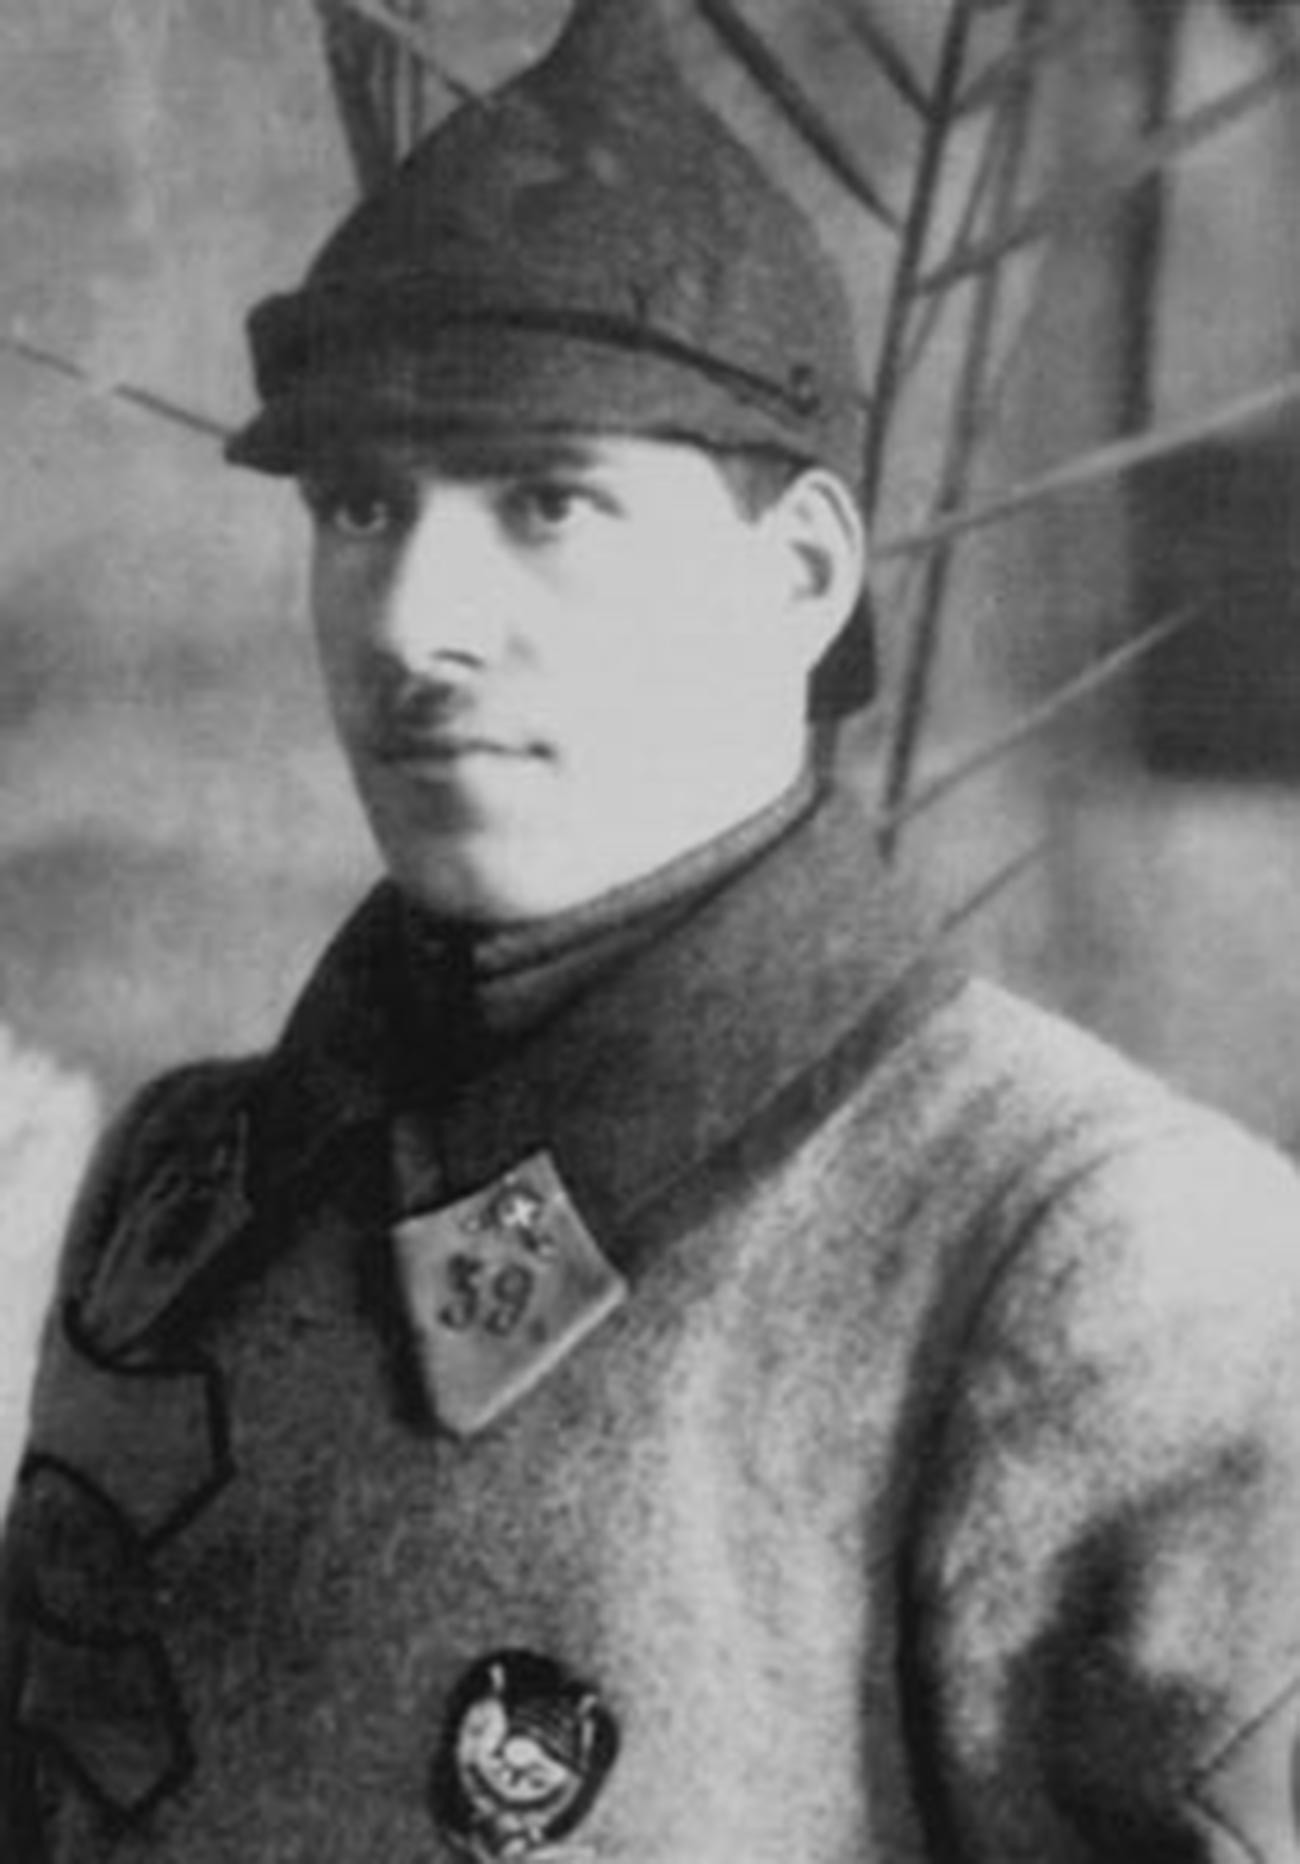 Joukov en 1923